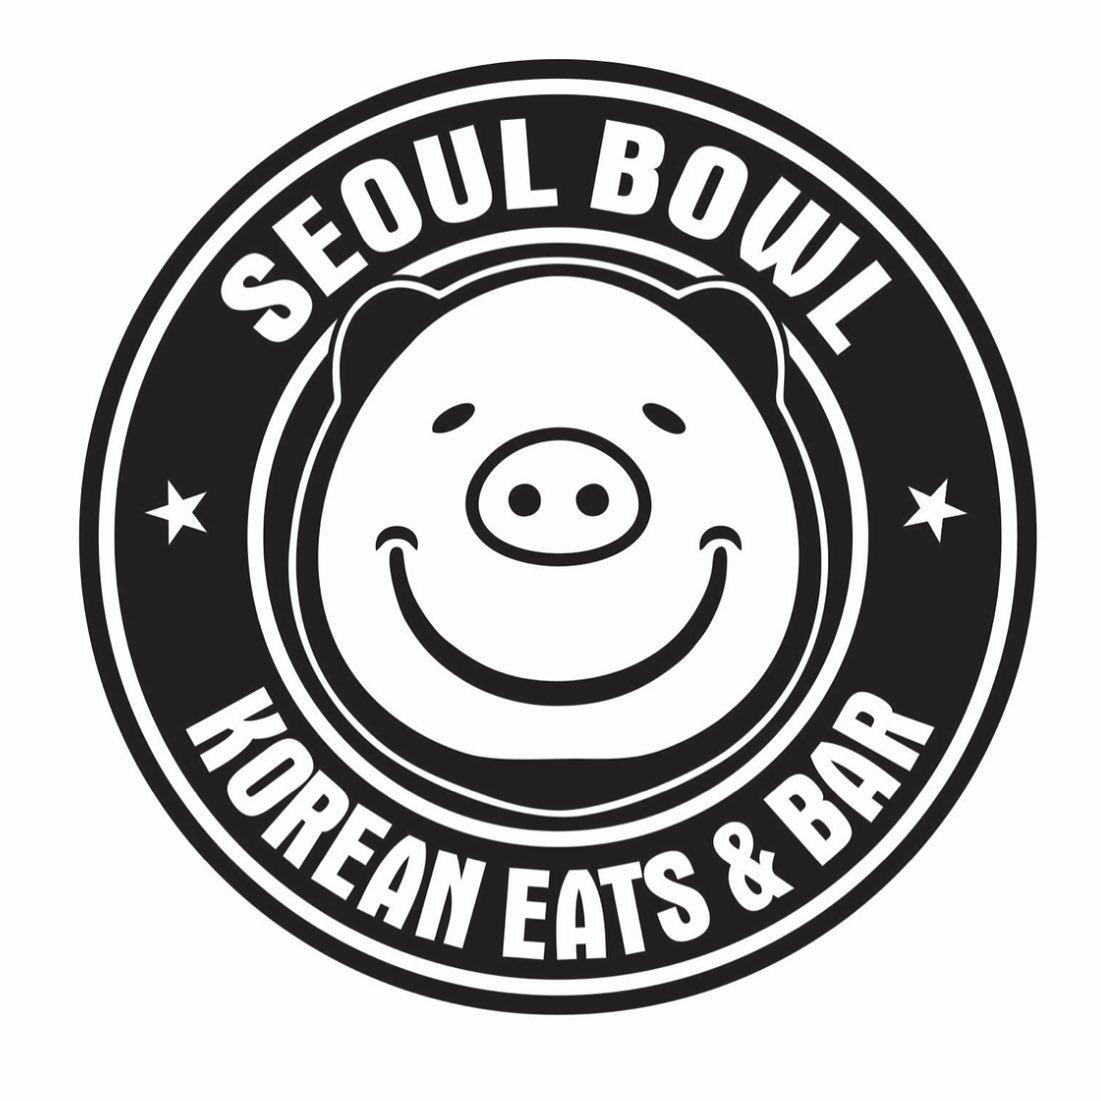 Seoul Bowl